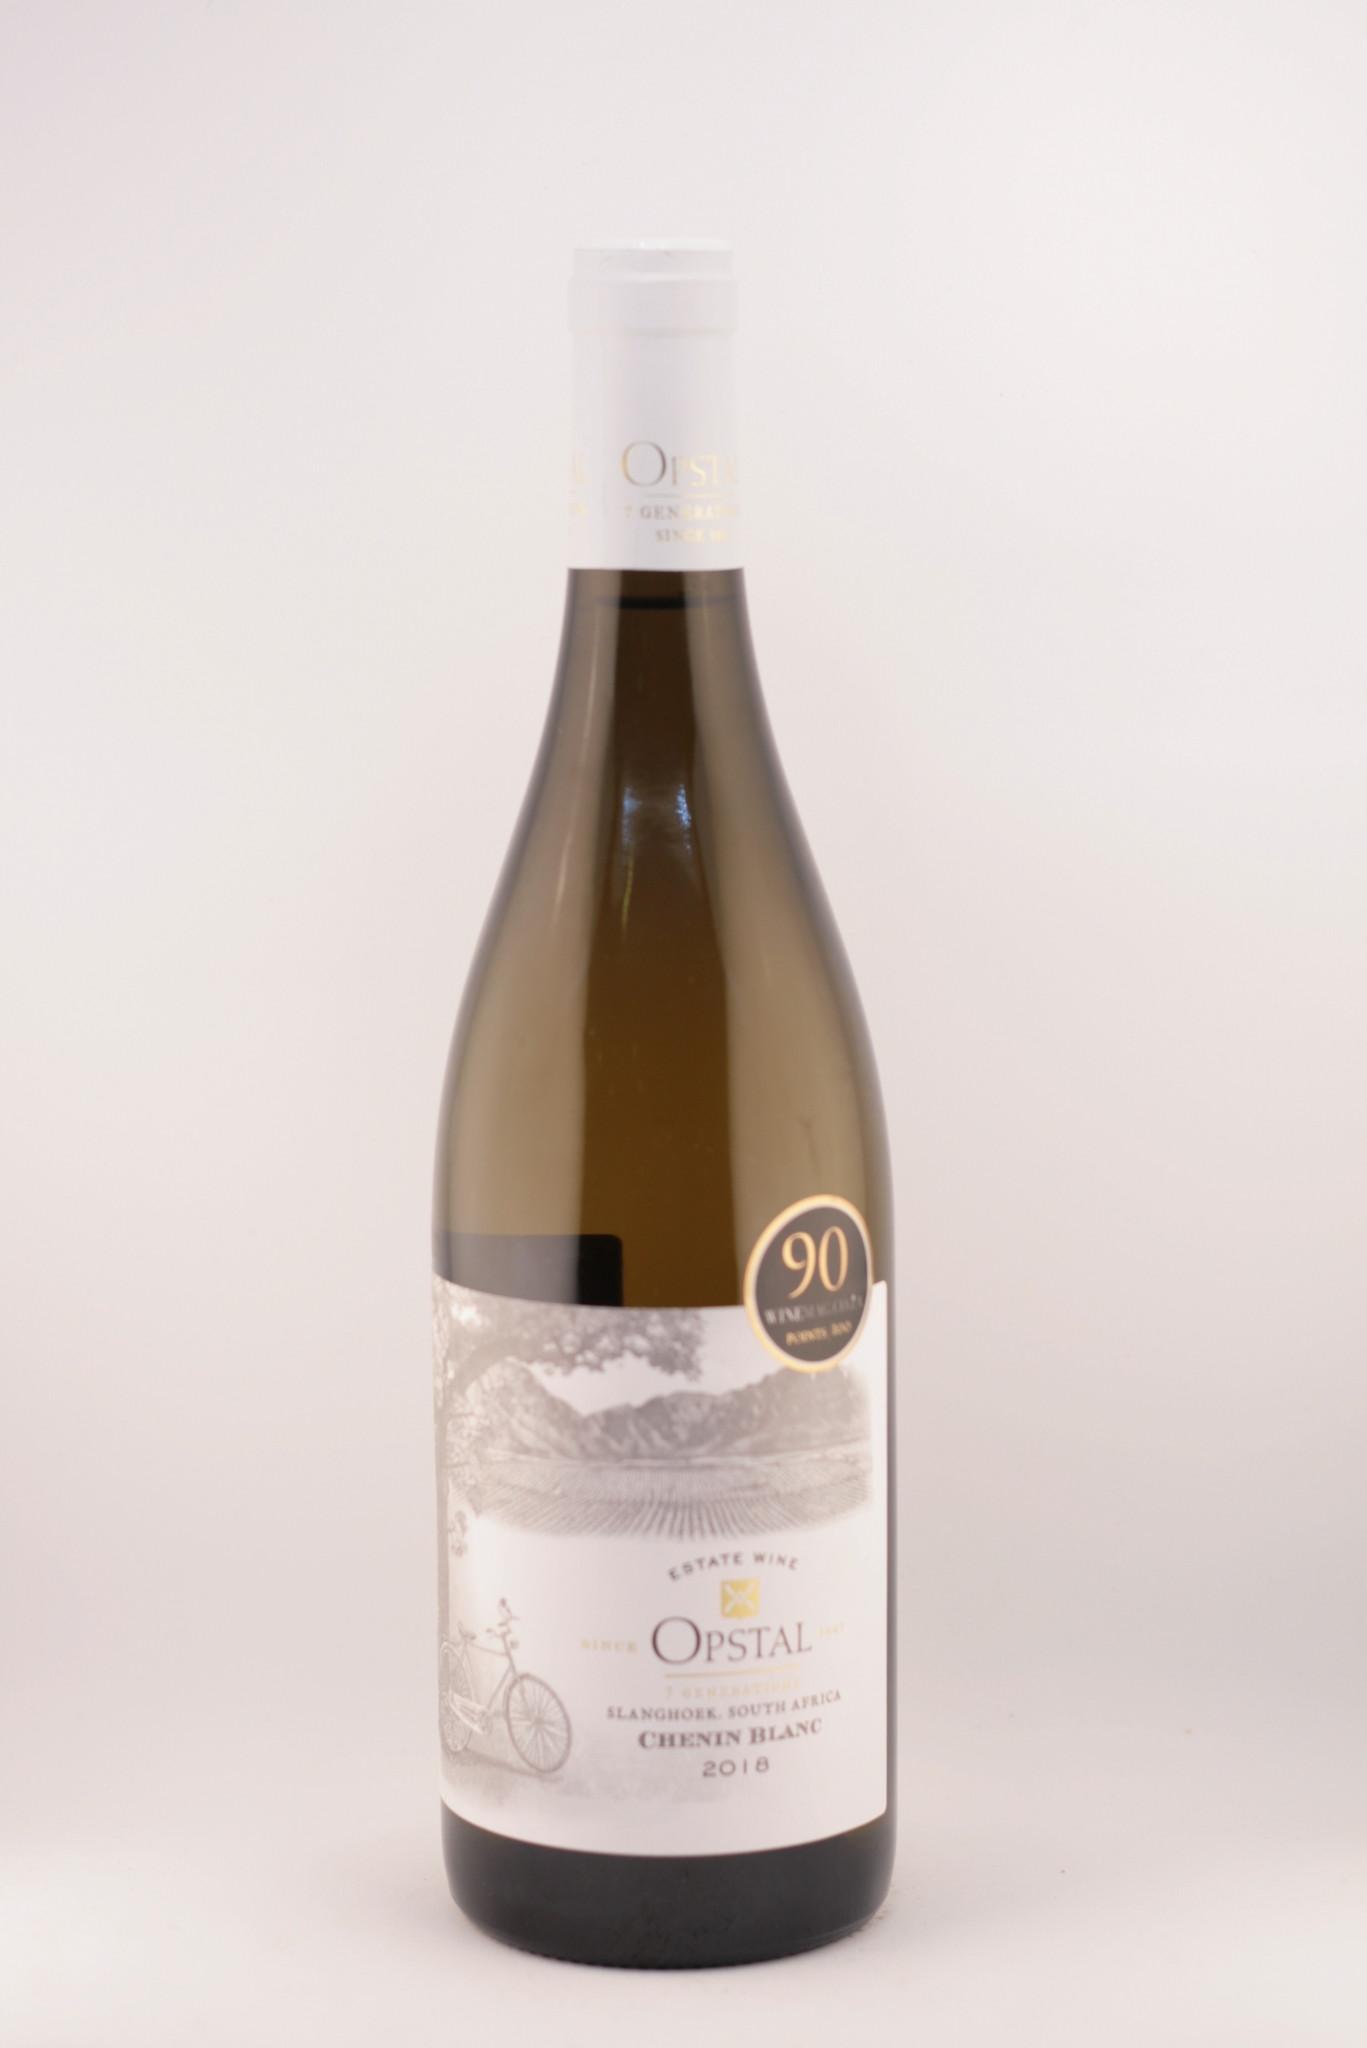 Estate wine |Opstal |Slanghoek | Chenin Blanc |2018